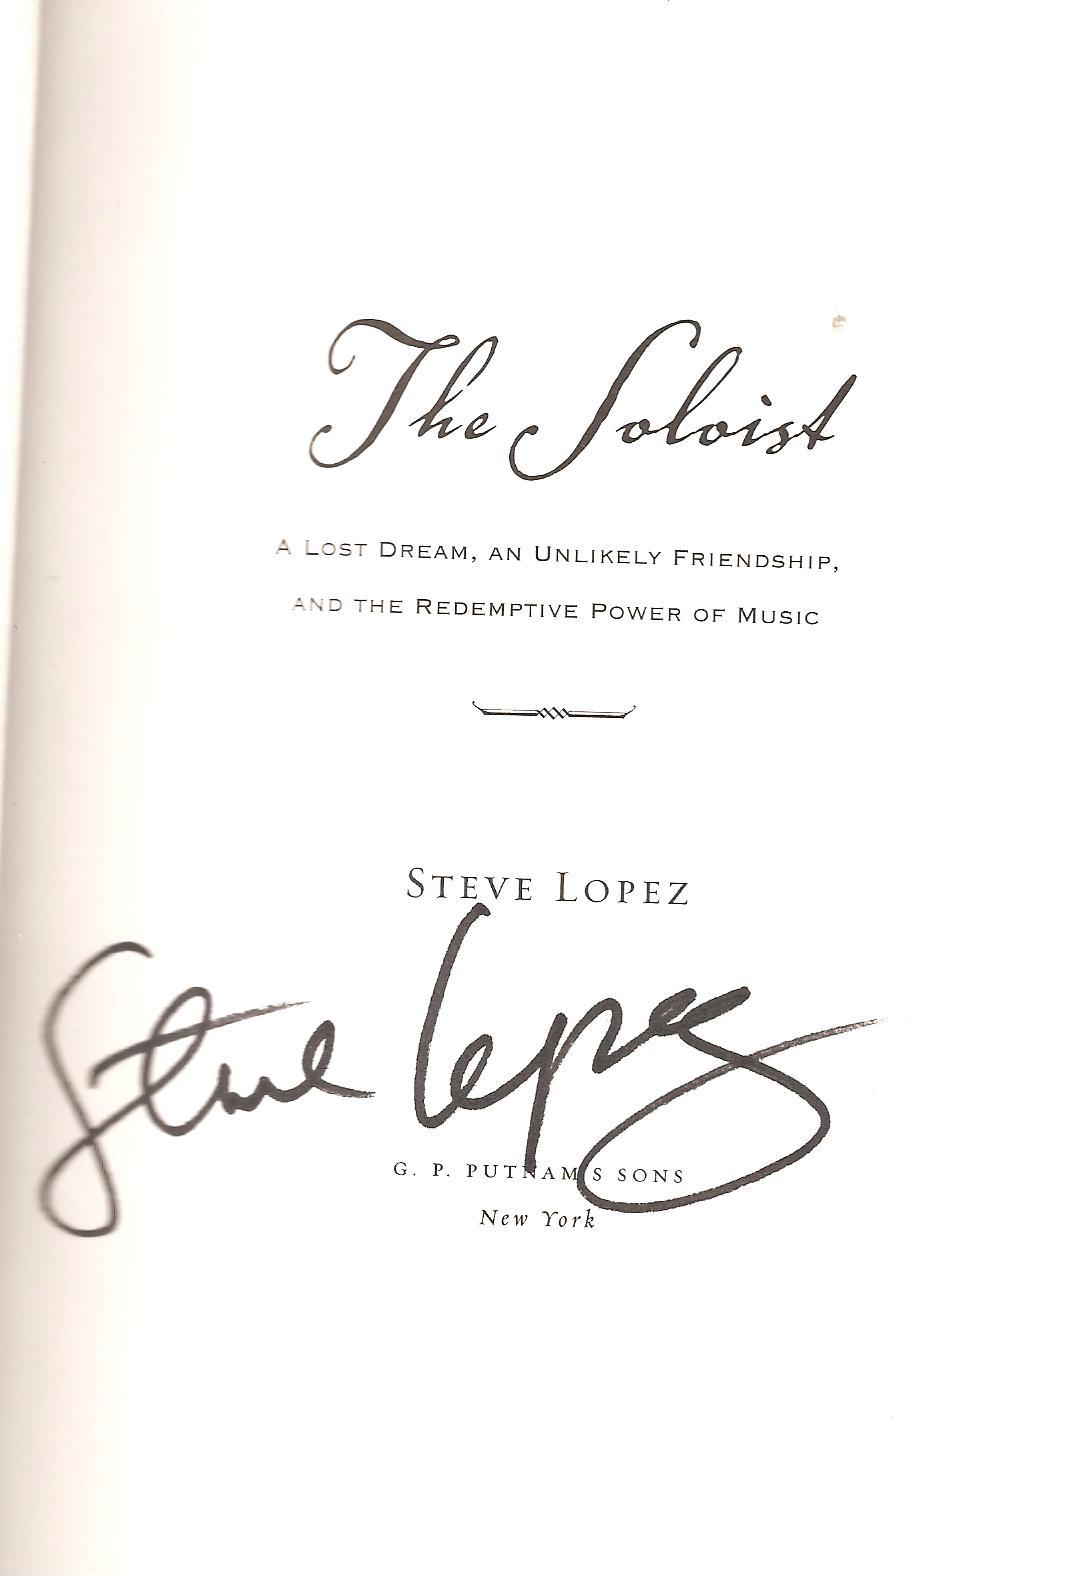 Steve Lopez